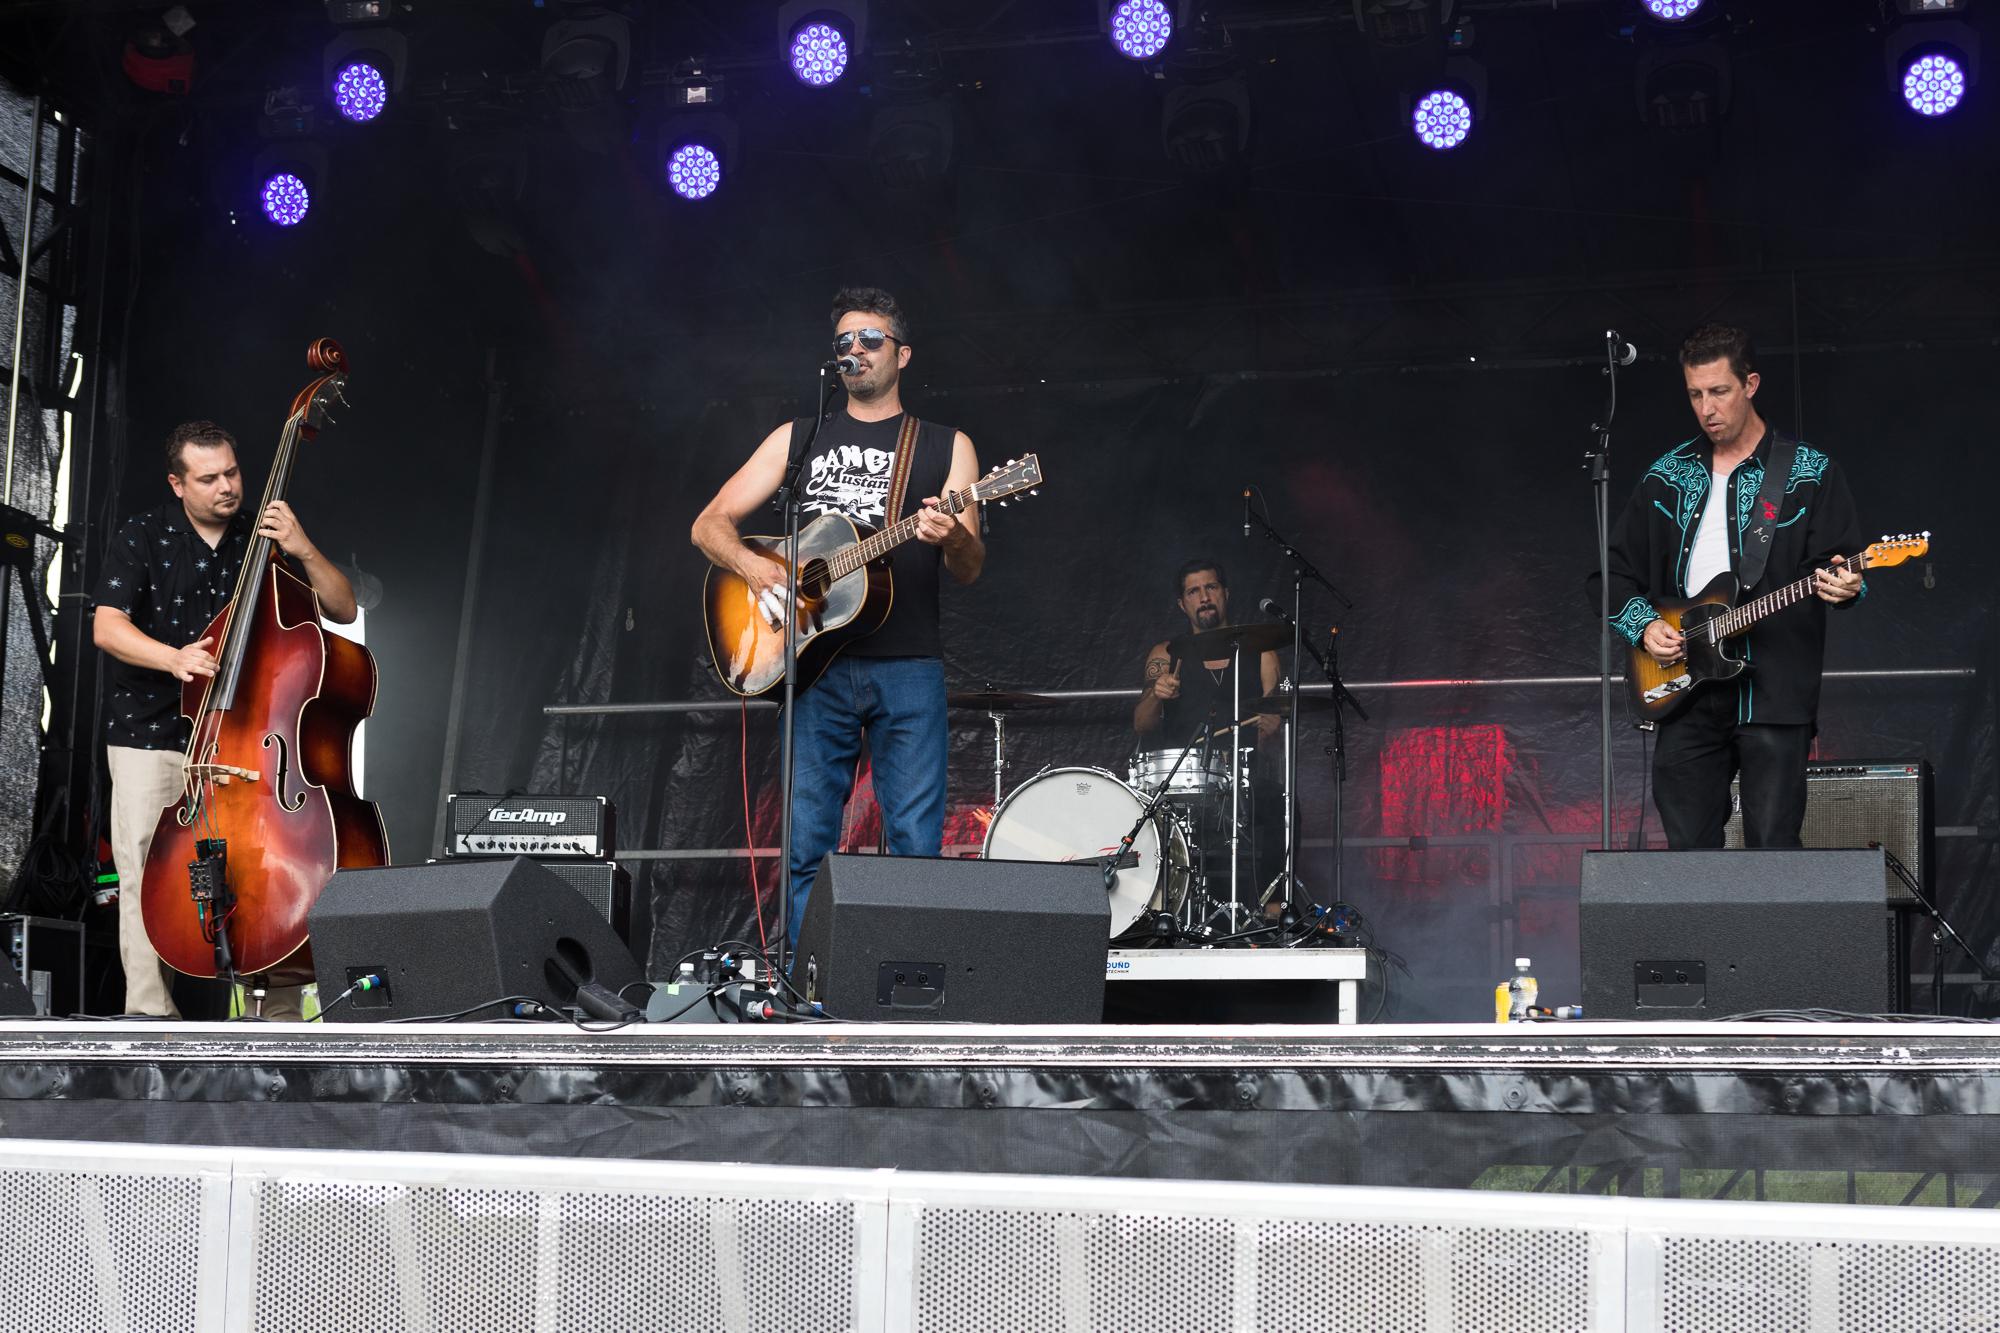 2018-06-21_The-Rob-Ryan-Roadshow-001